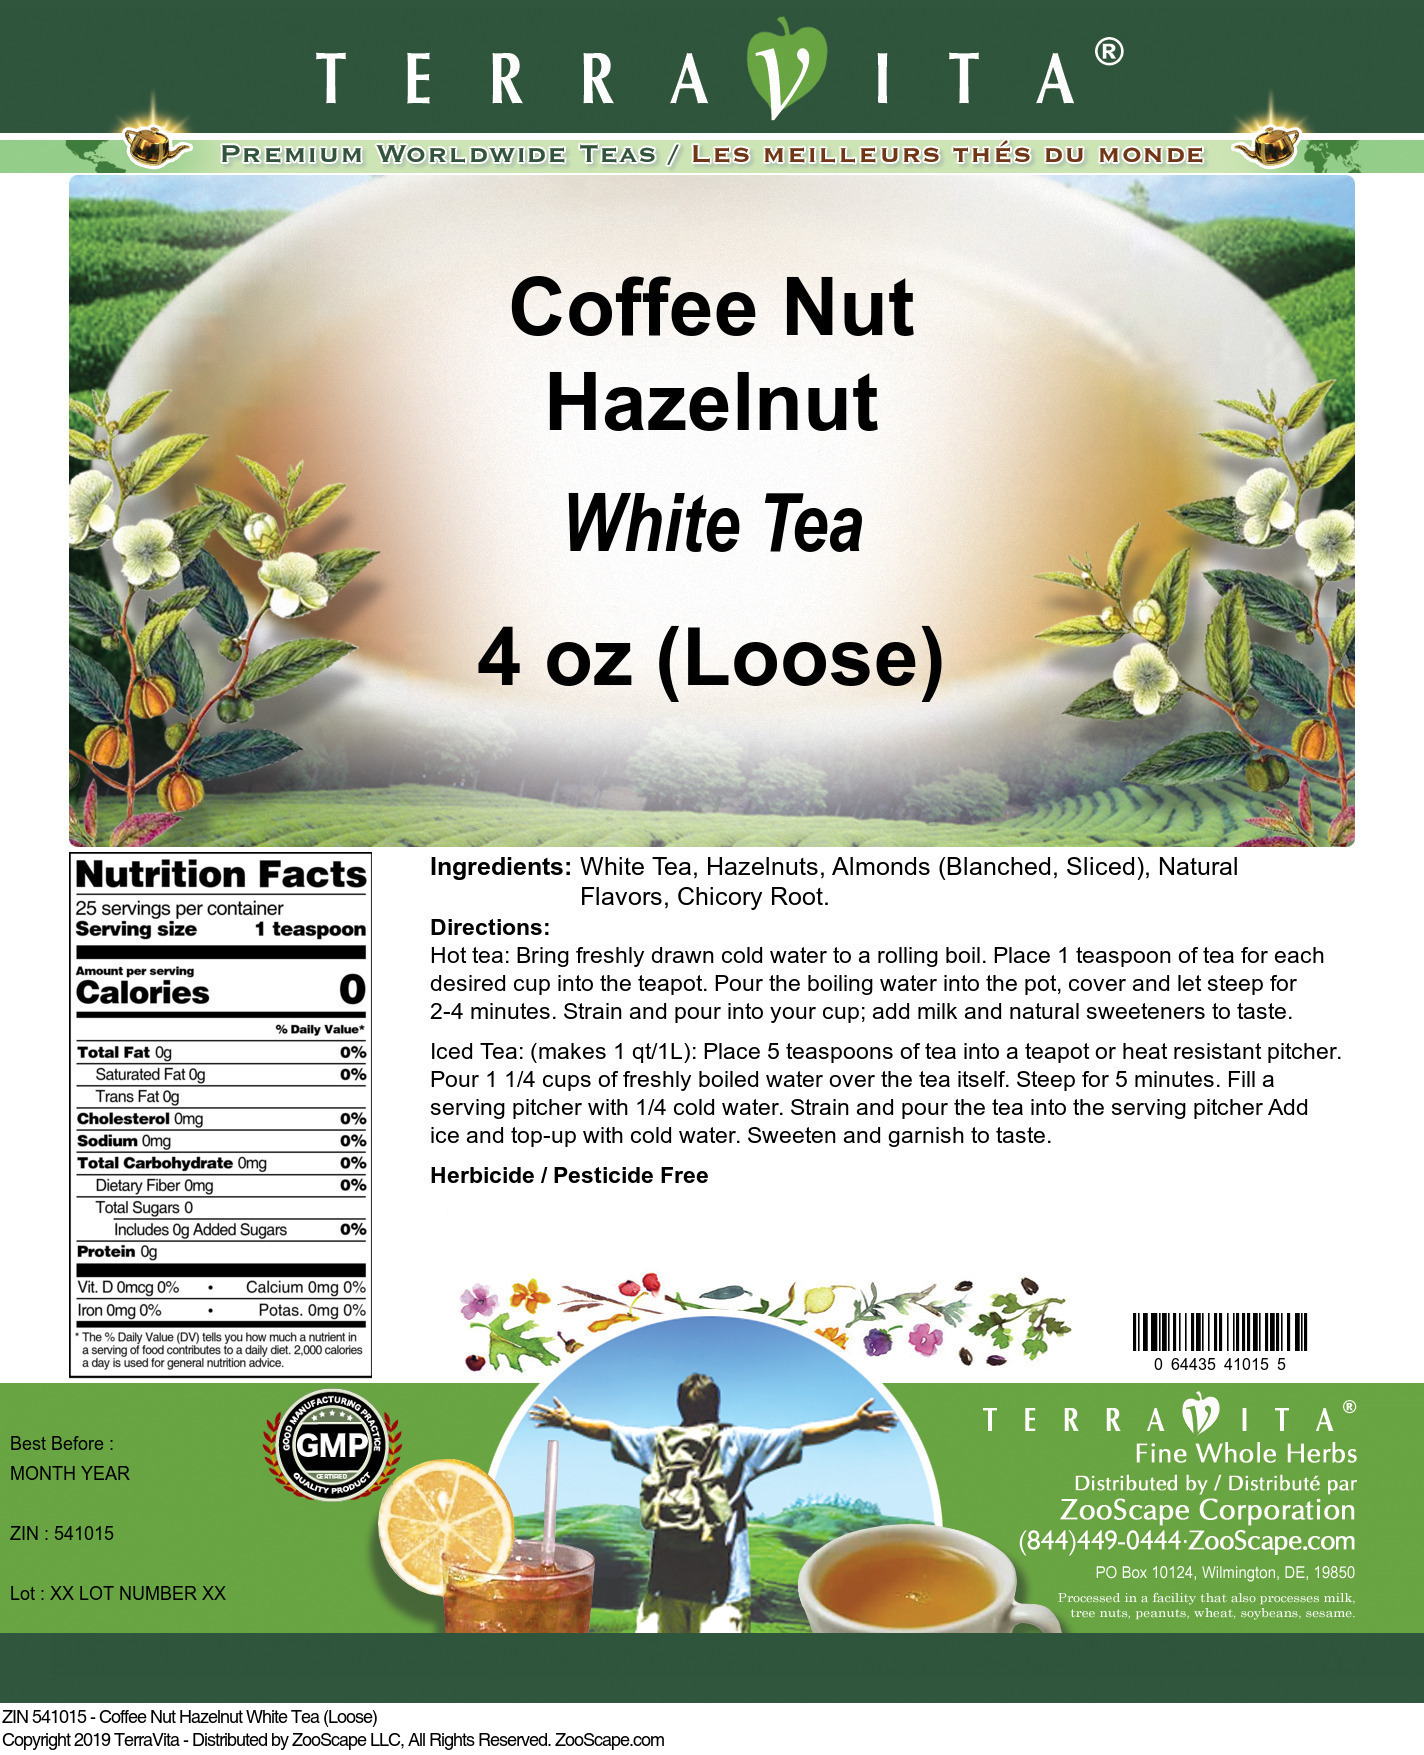 Coffee Nut Hazelnut White Tea (Loose)